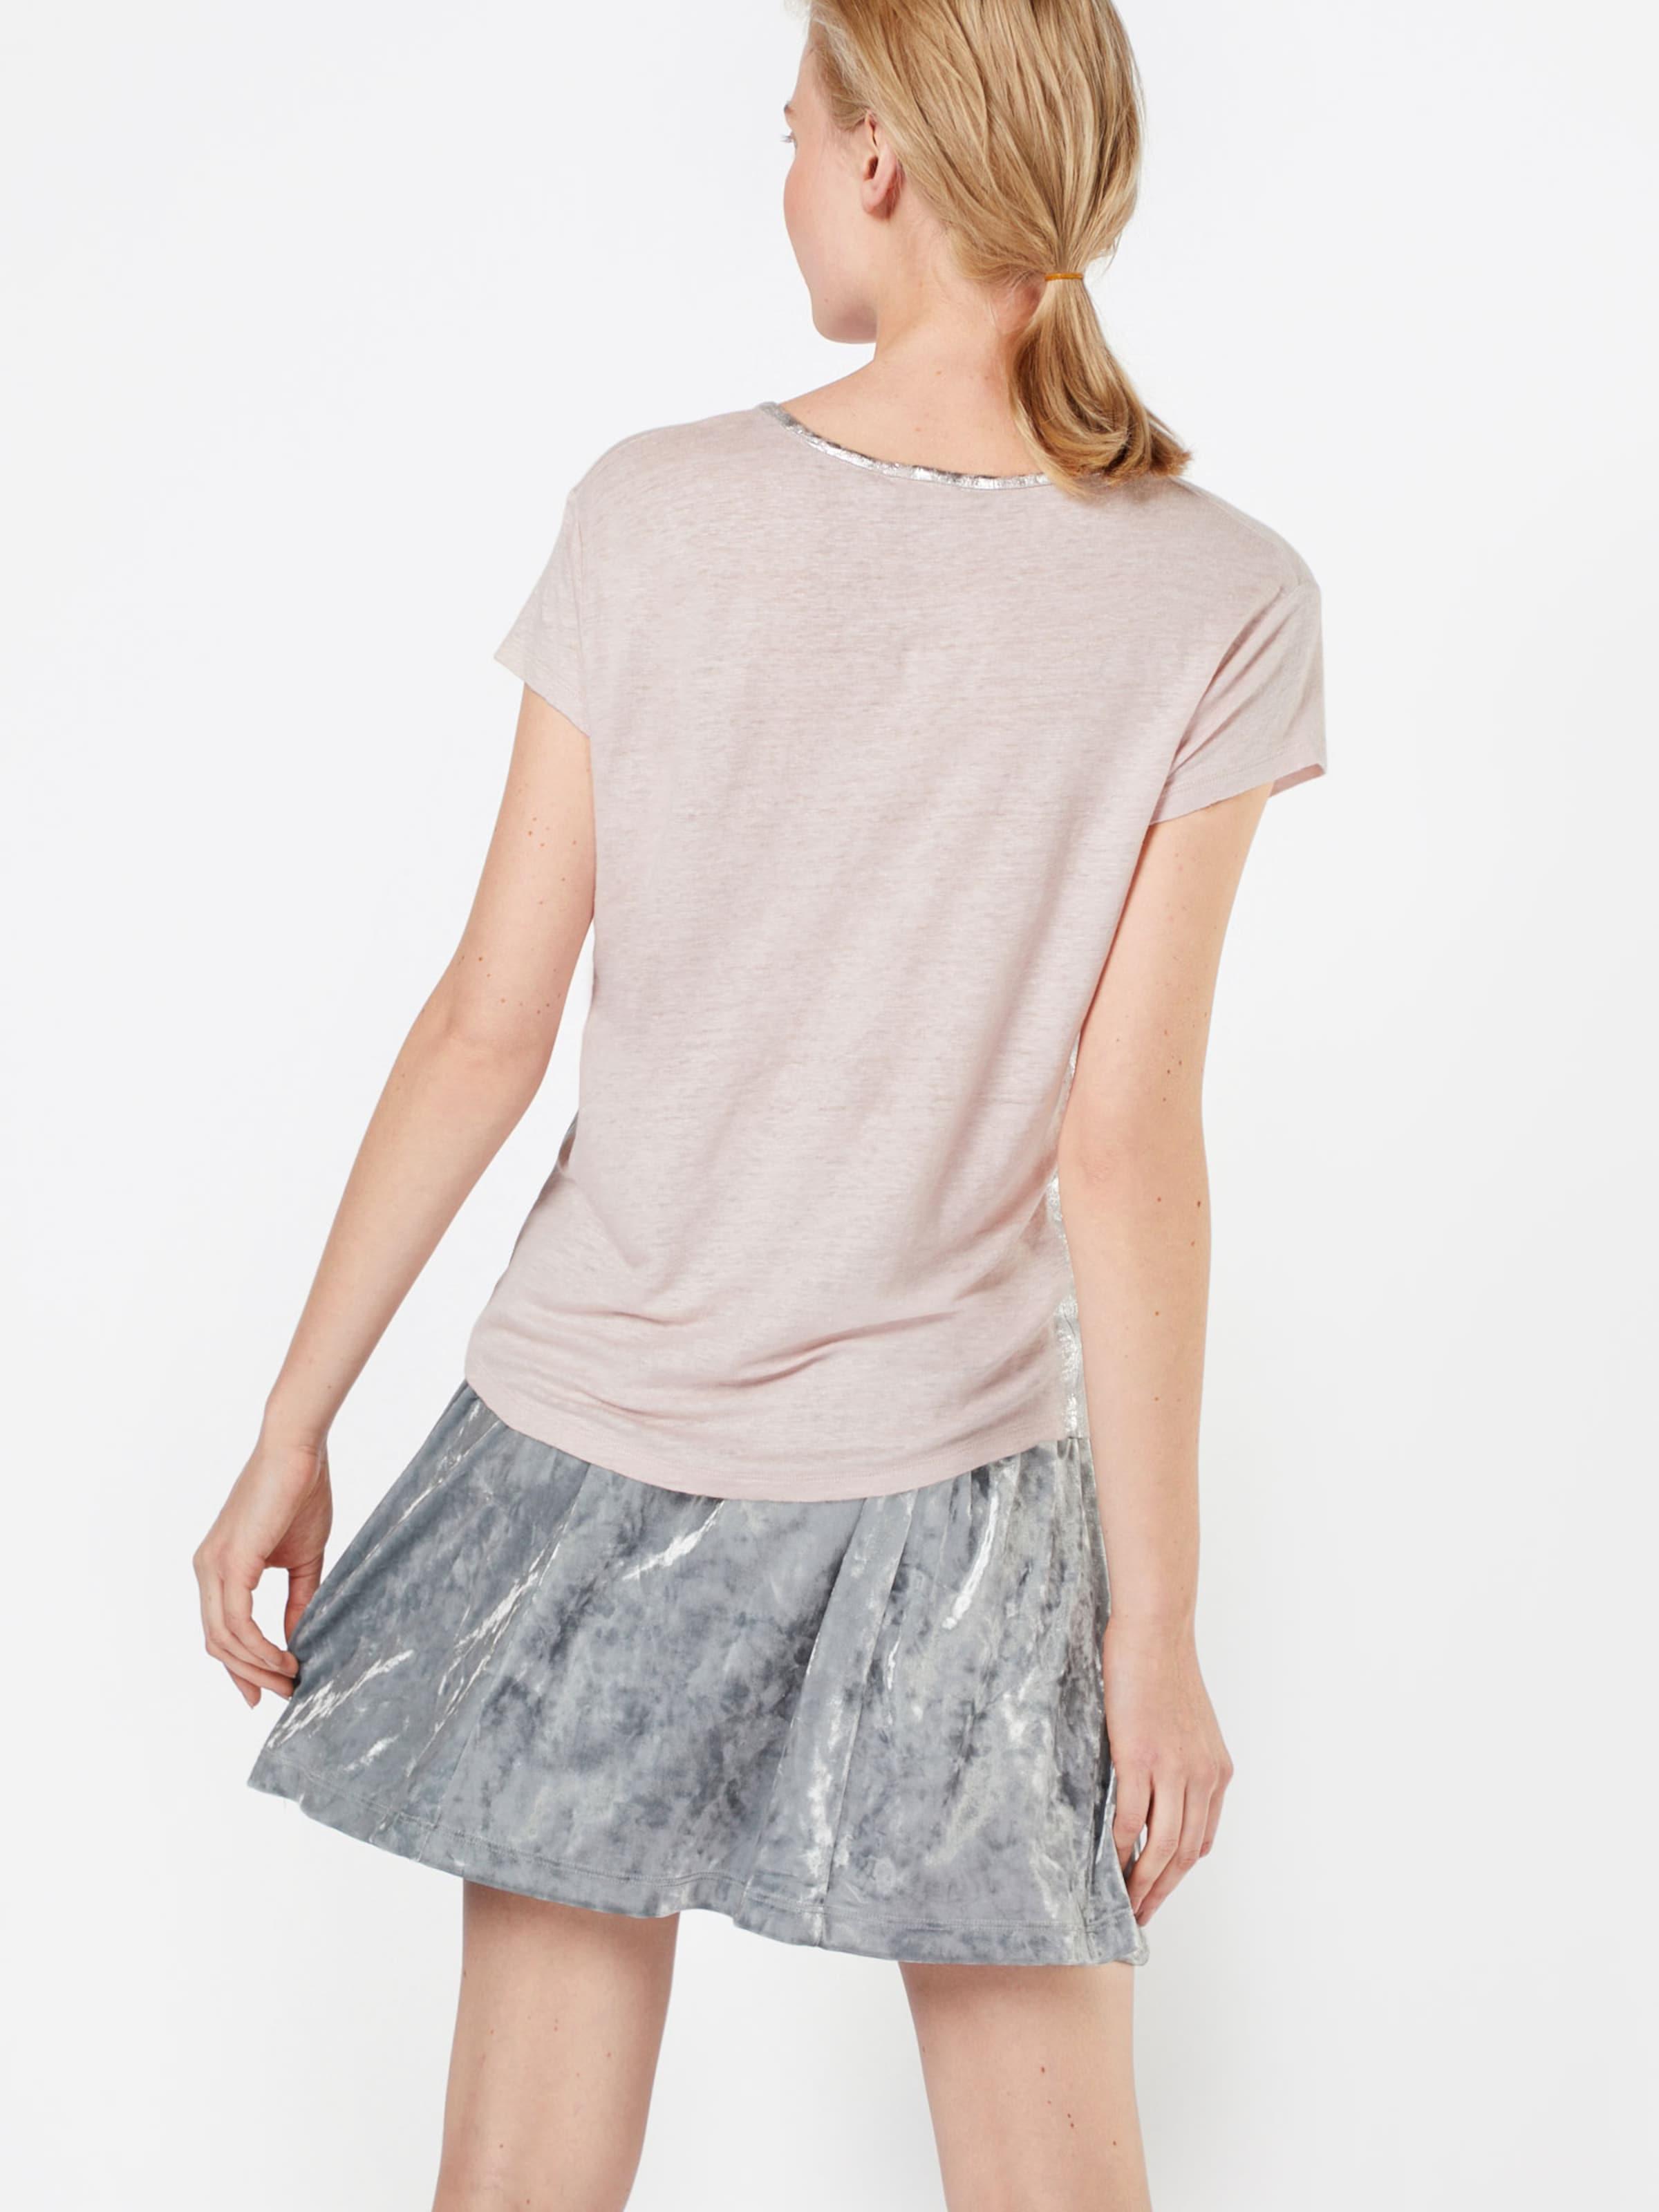 Billig Authentisch twenty tees T-Shirt 'Let´s Go to the Beach' Steckdose Mit Paypal Um 7mixGb